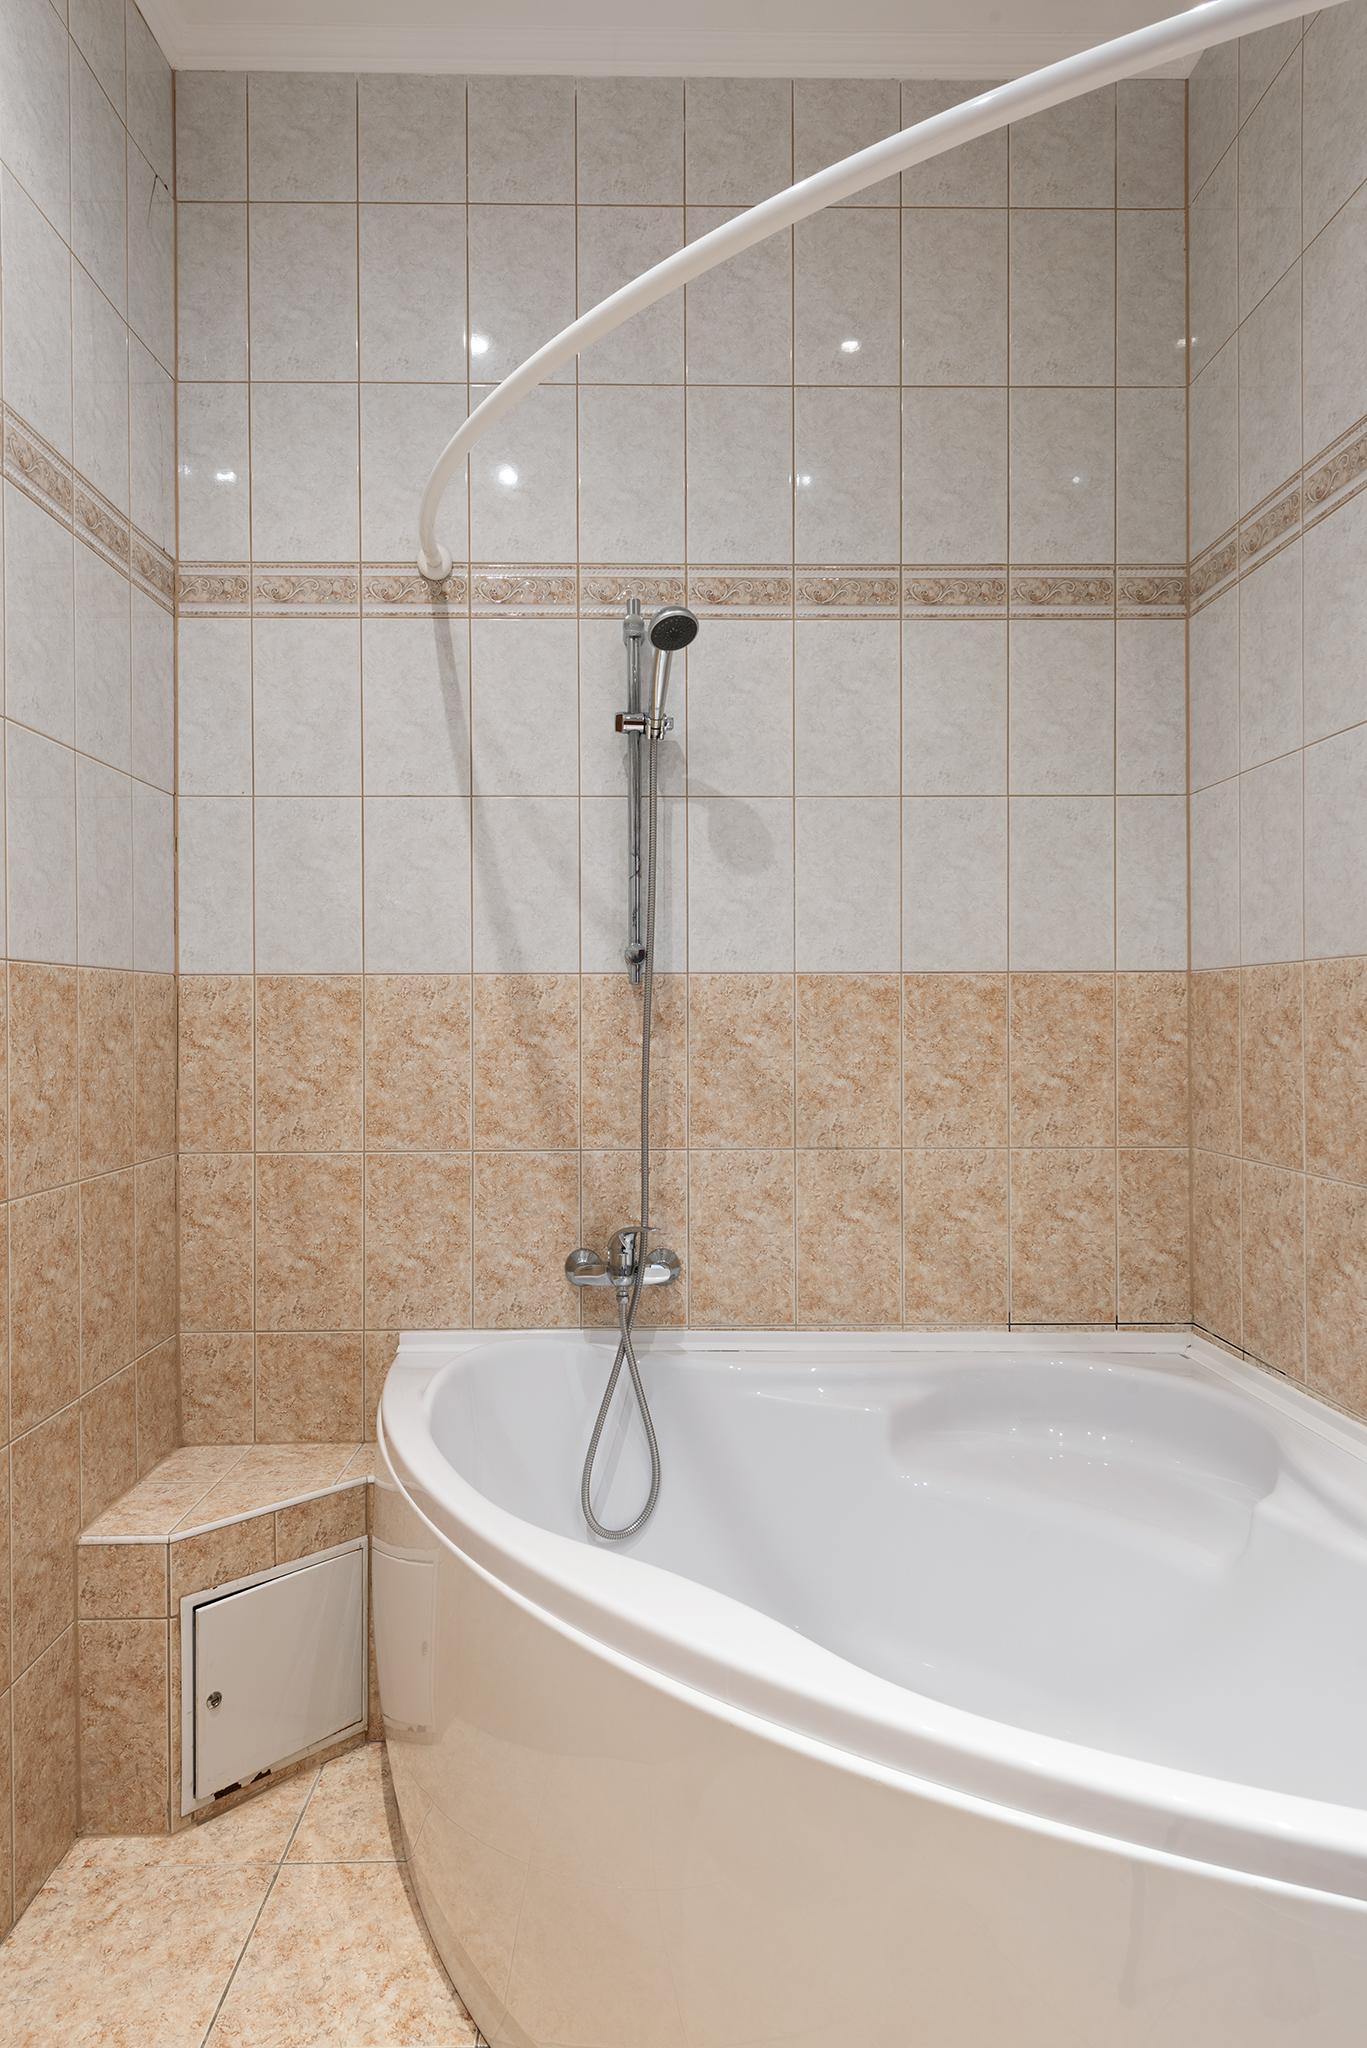 Investissement Immobilier Kiev, Ukraine - Salle de bains